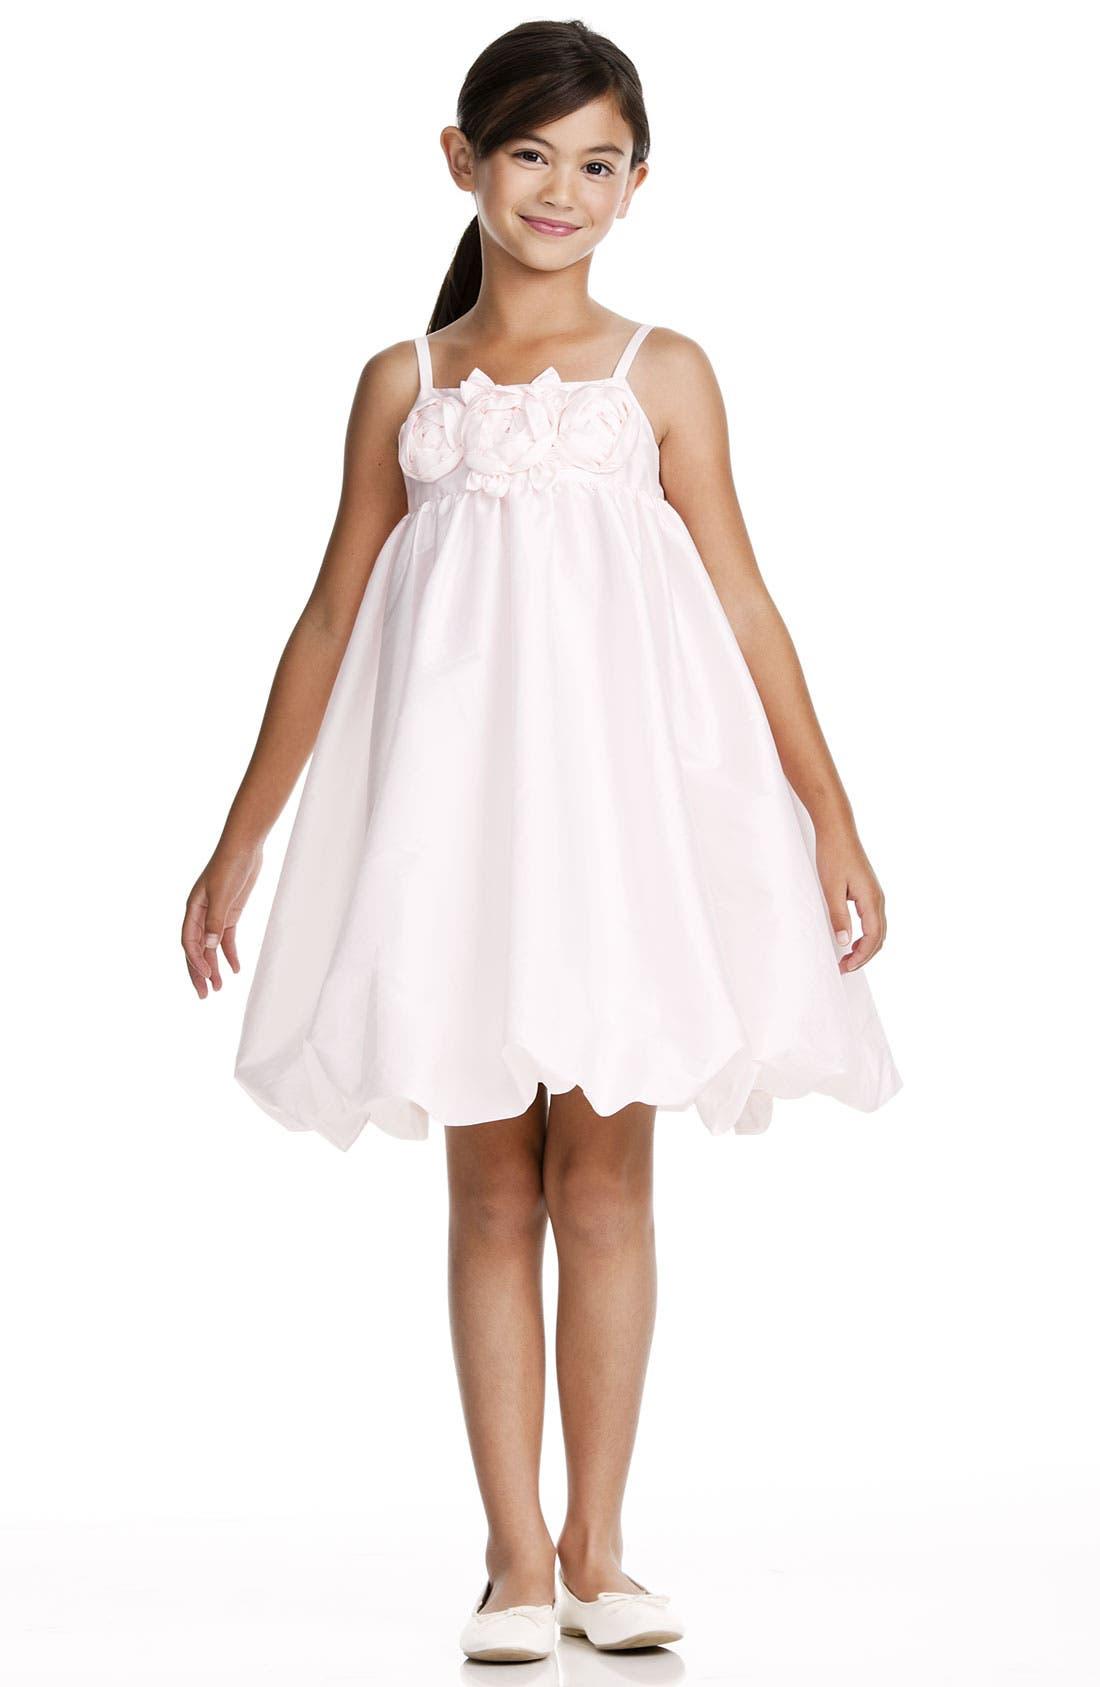 Alternate Image 1 Selected - Us Angels Taffeta Rosette Bubble Dress (Toddler)